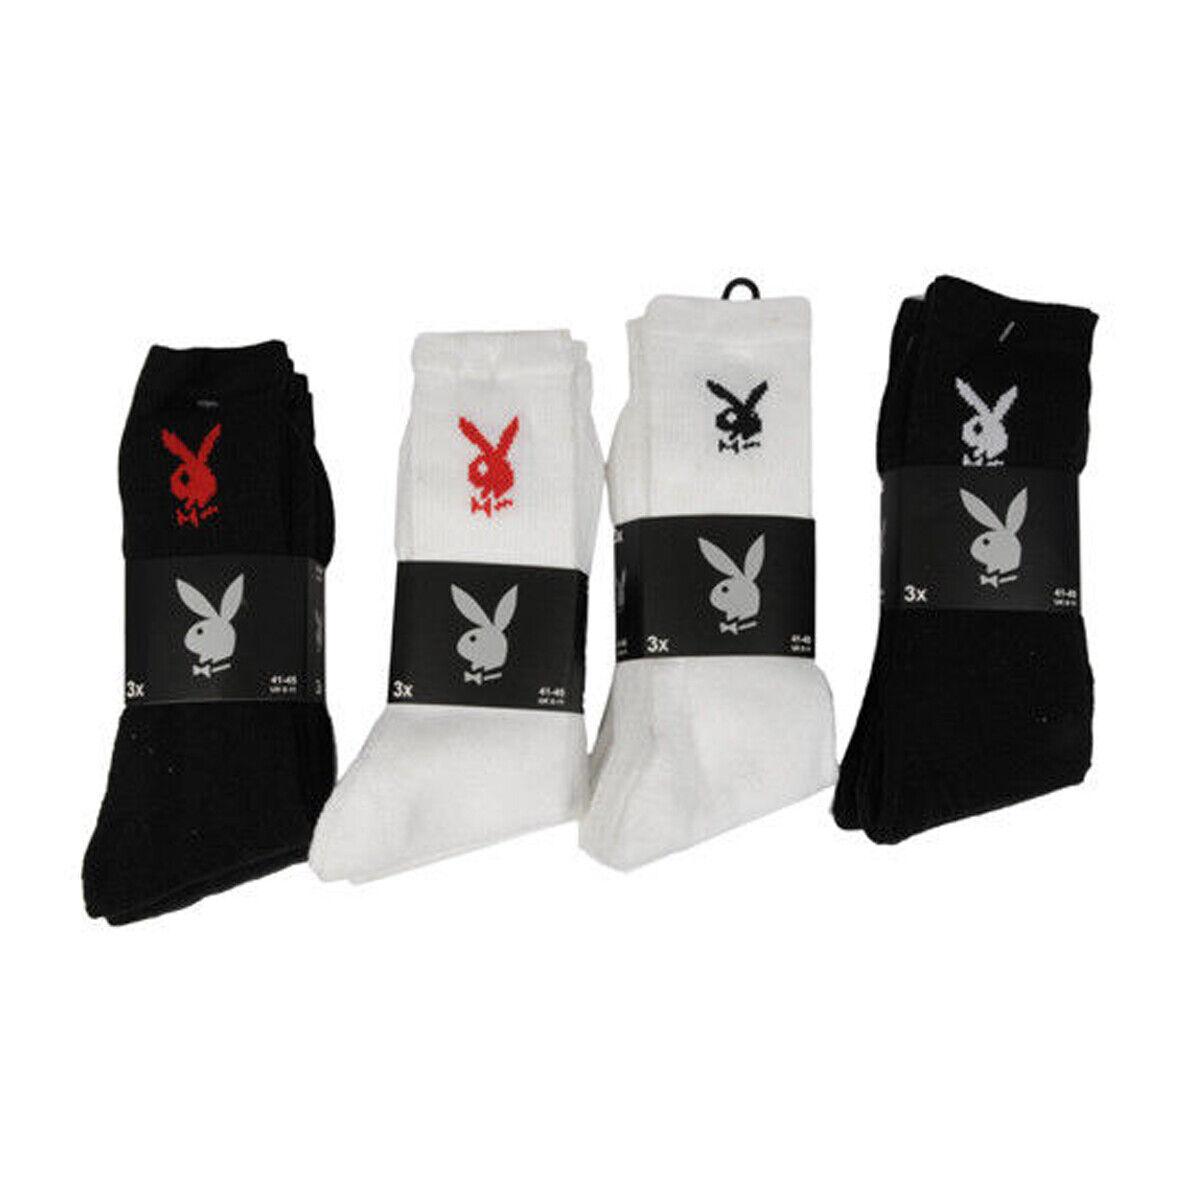 e7fbe027b3b9c 6 X Playboy Socken - Strümpfe - Sportsocken - Tennissocken GR- 41 - 45